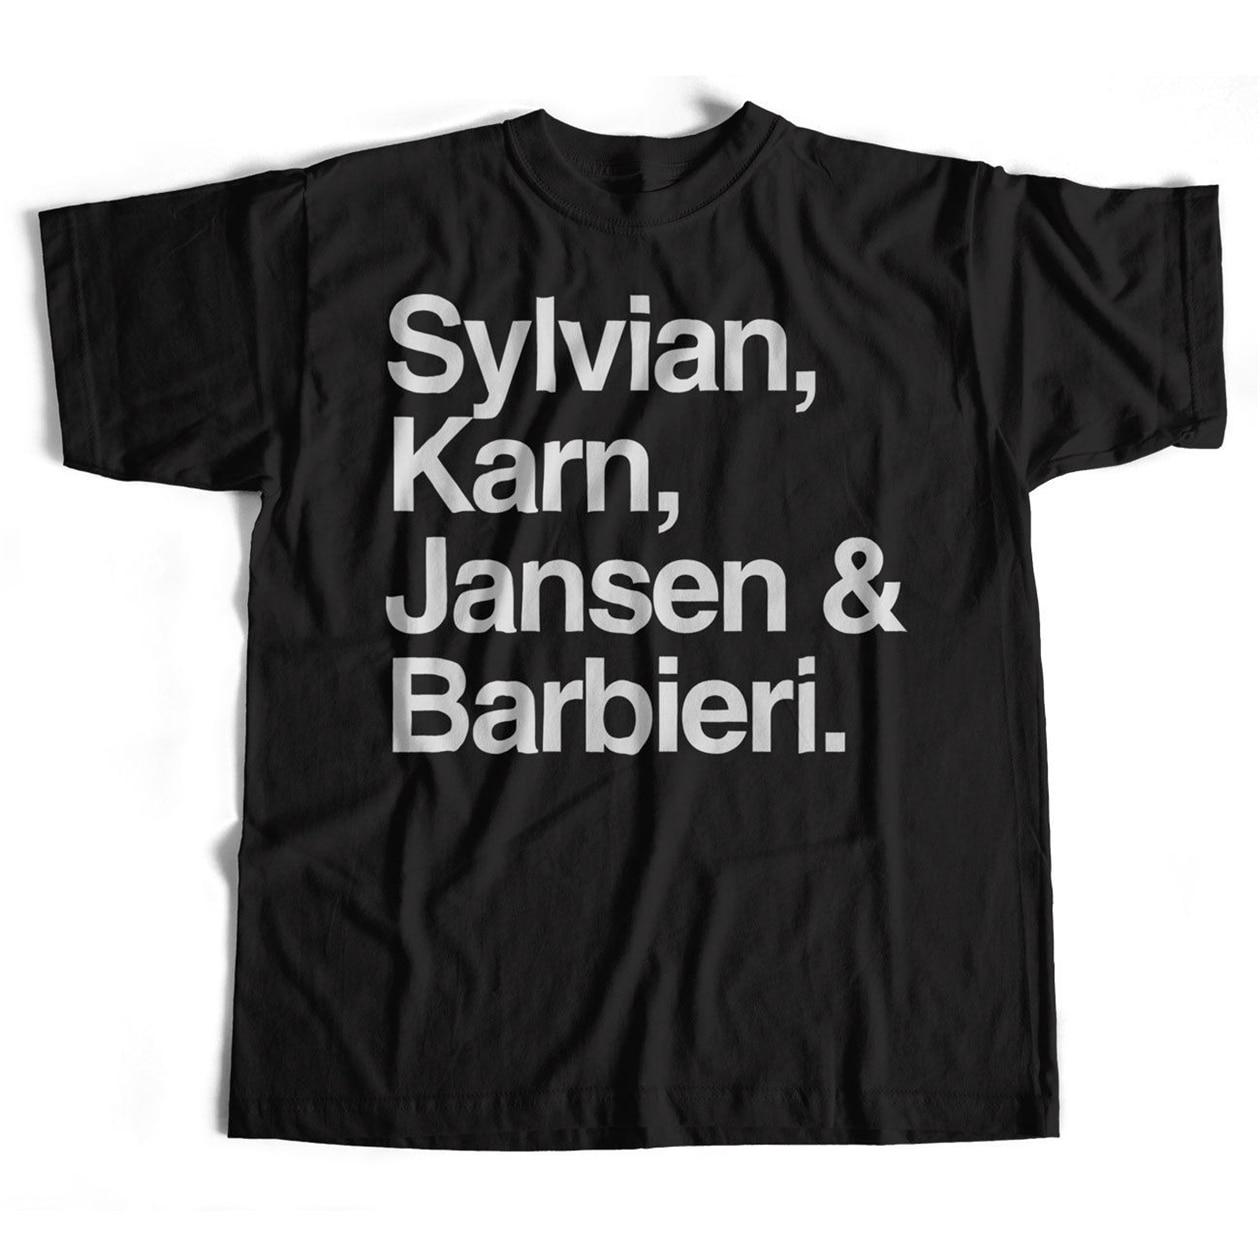 Japan Names Tops Tee T Shirt An Old Skool Hooligans Rock Names David Sylvian T-Shirt Vintage Graphic